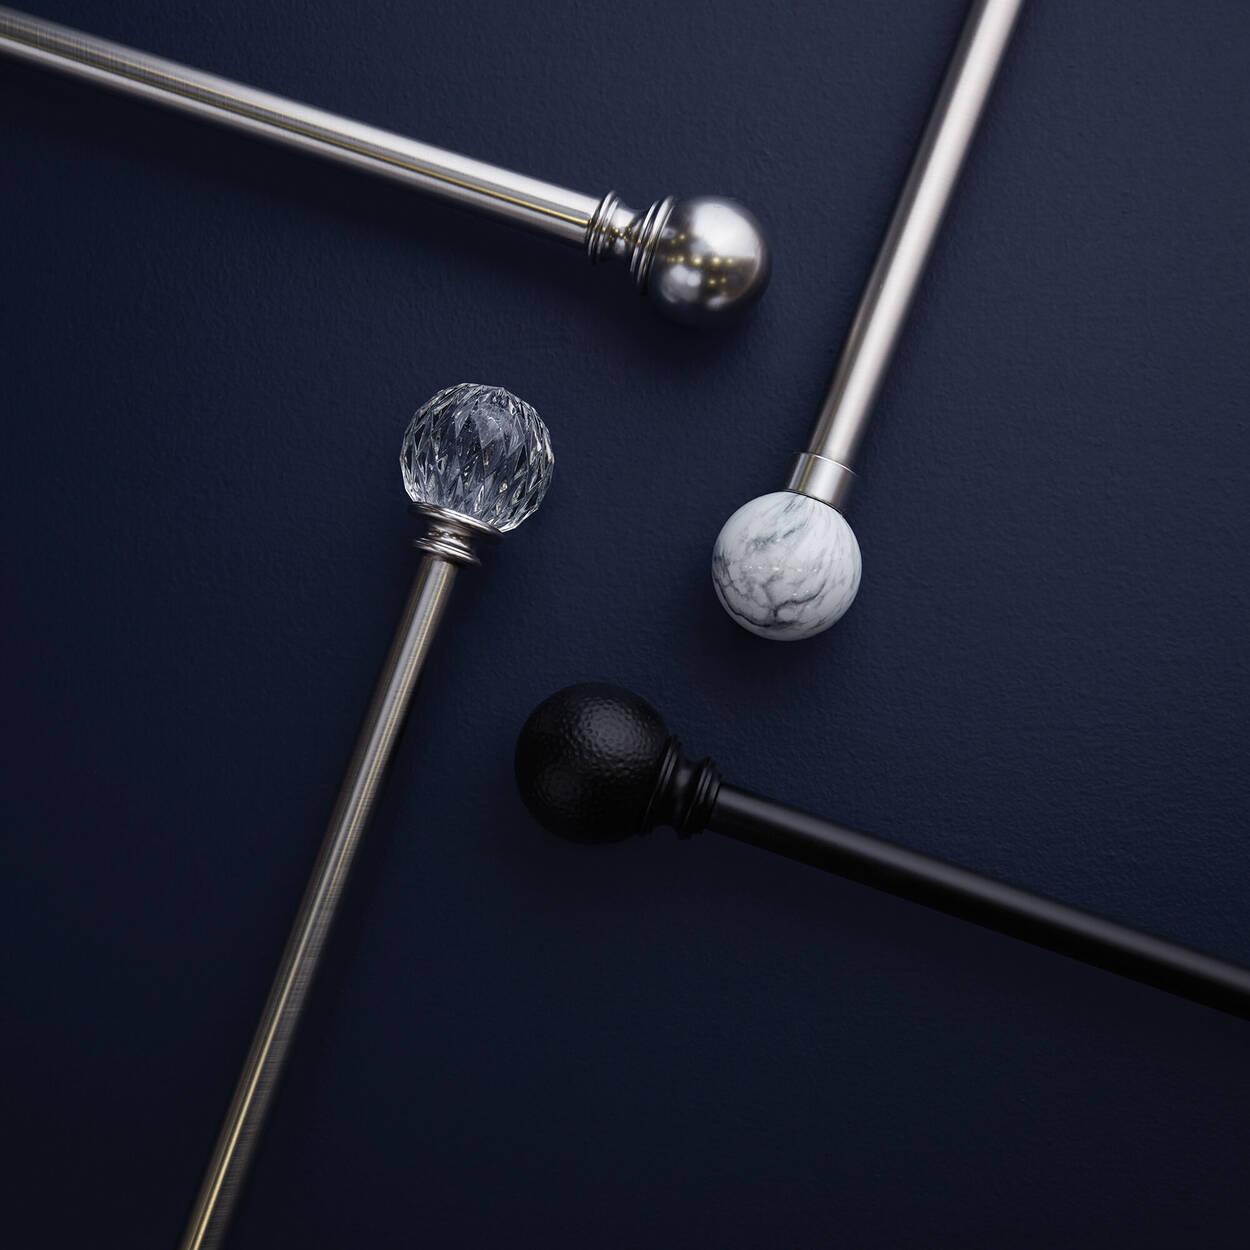 Marble Pattern Curtain Rod Set - Diameter 25/28 mm